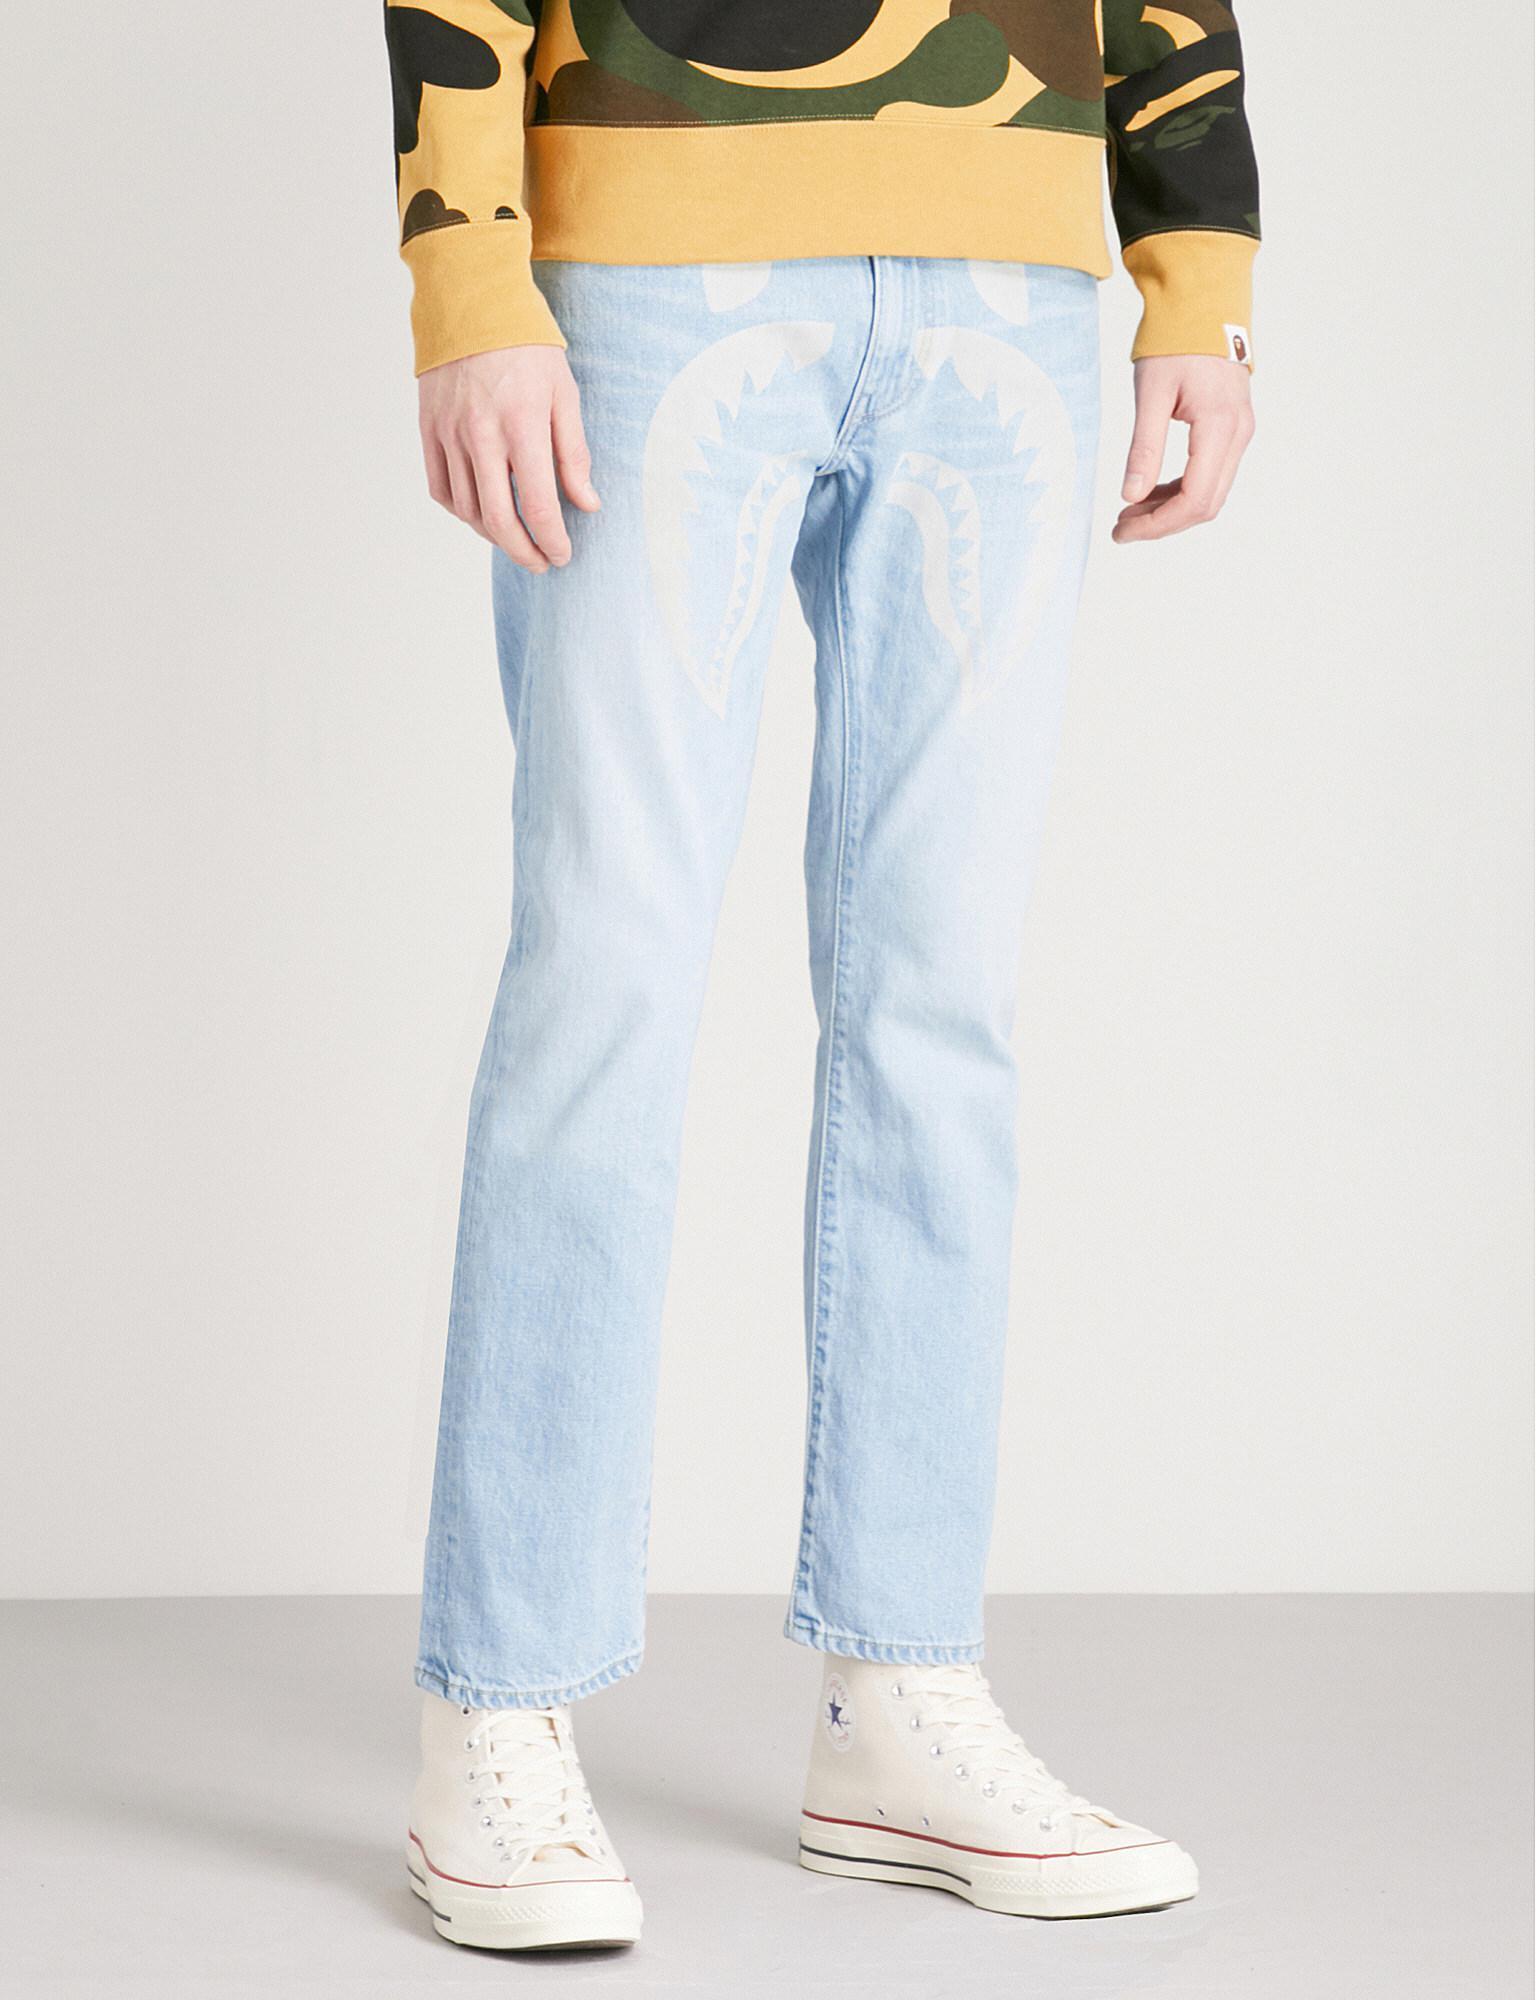 949c1cb873e4 Lyst - A Bathing Ape Shark-print Regular-fit Straight Jeans in Blue ...